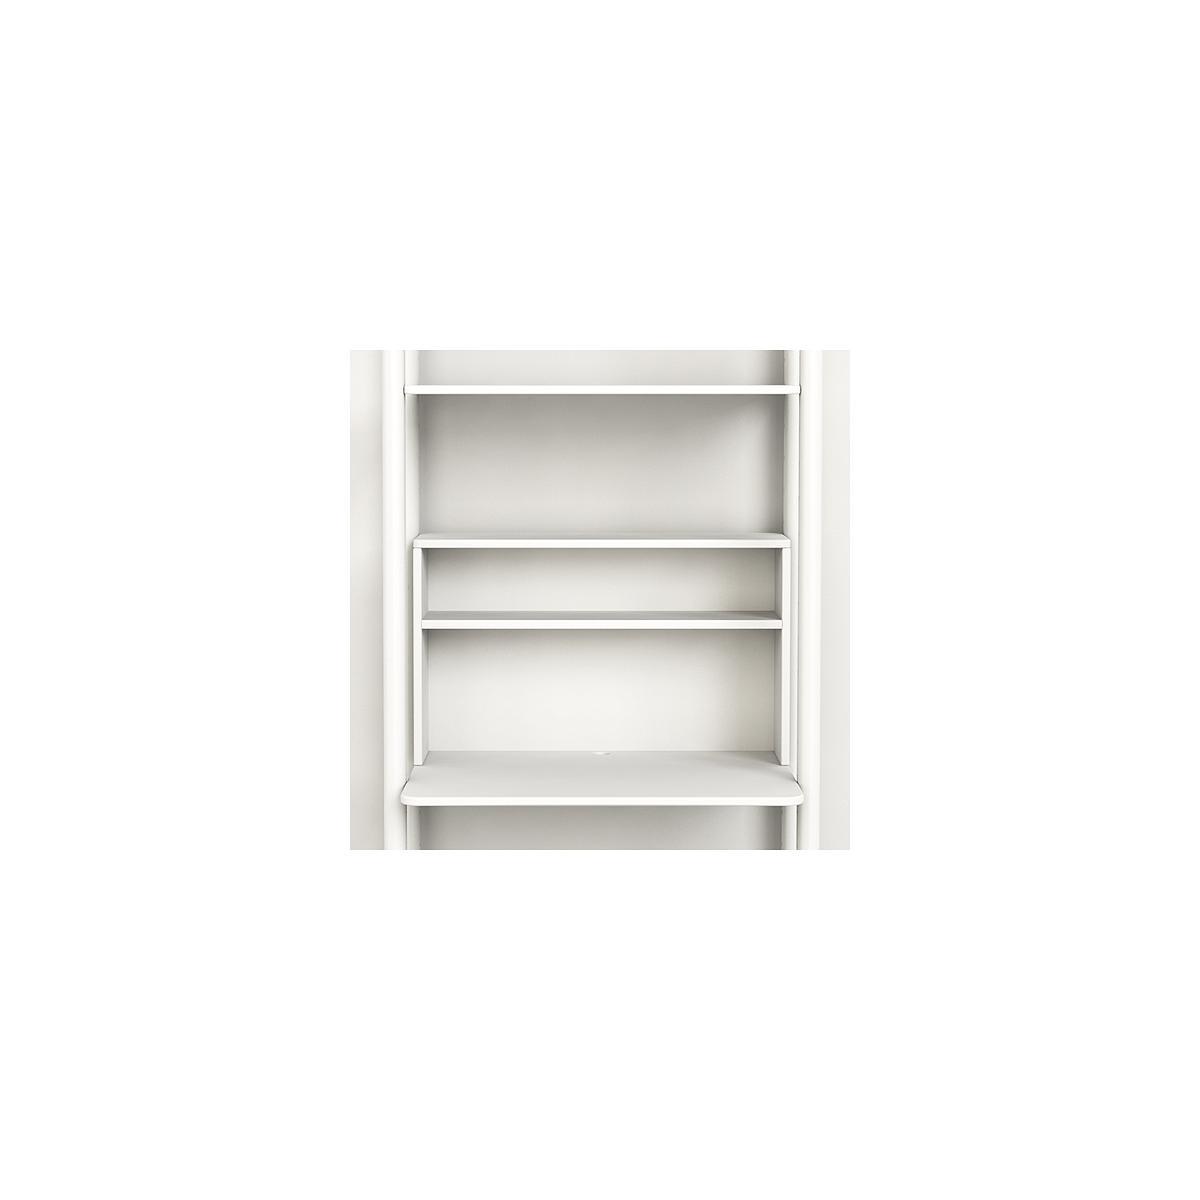 Maxi D - Escritorio 189 cm SHELFIE Flexa blanco